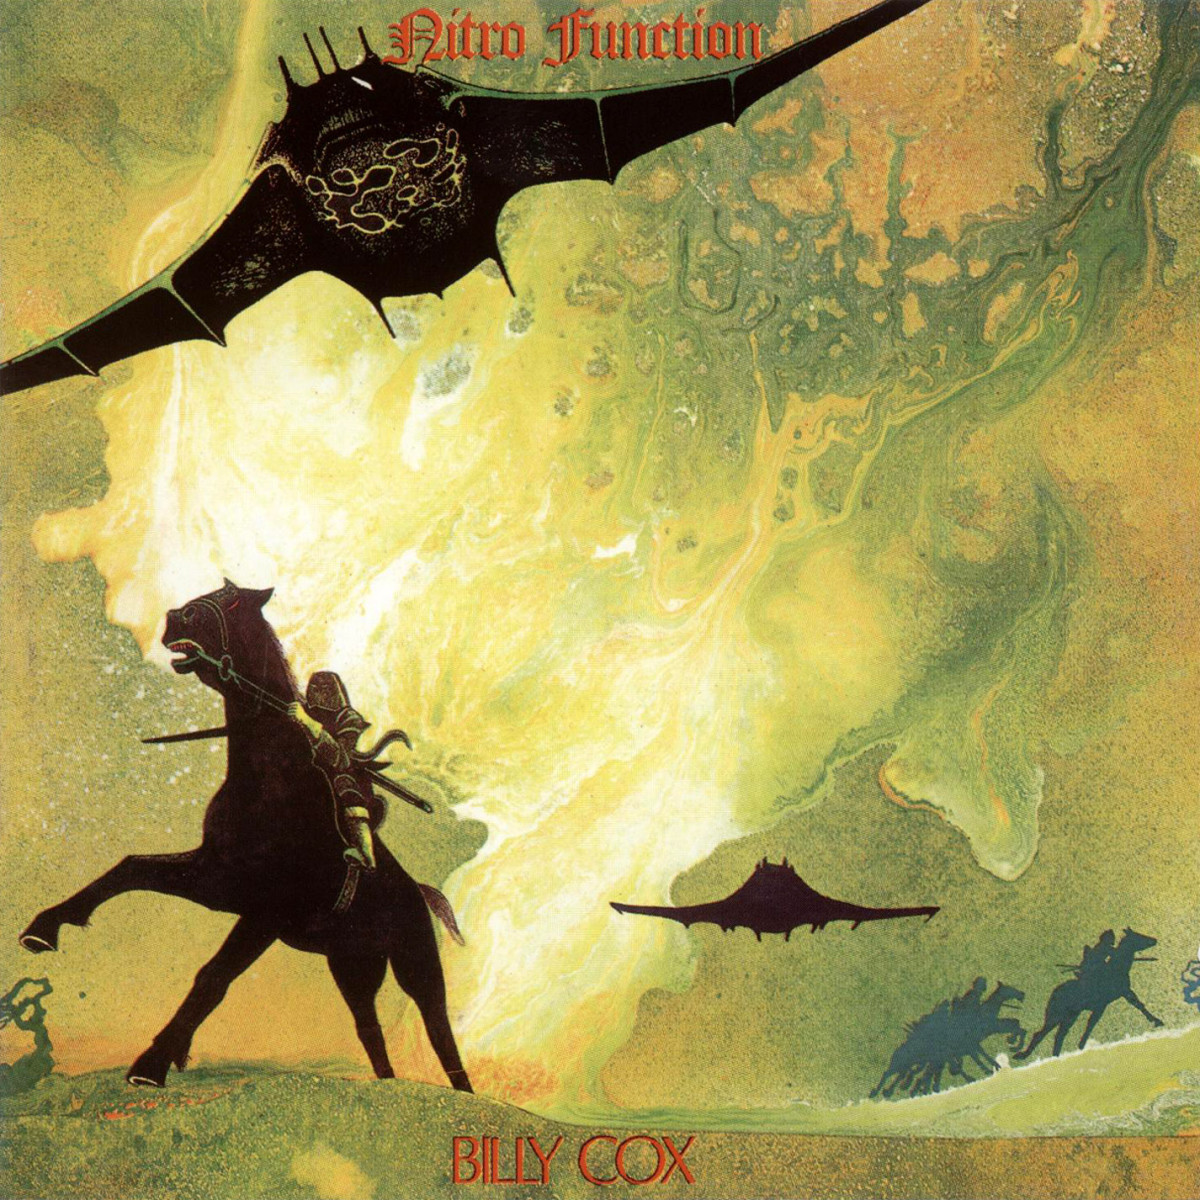 "Billy Cox ""Nitro Function"" PYE International Records 12"" LP Vinyl Record, UK Pressing (1972) Album Cover Art & Design by Roger Dean"